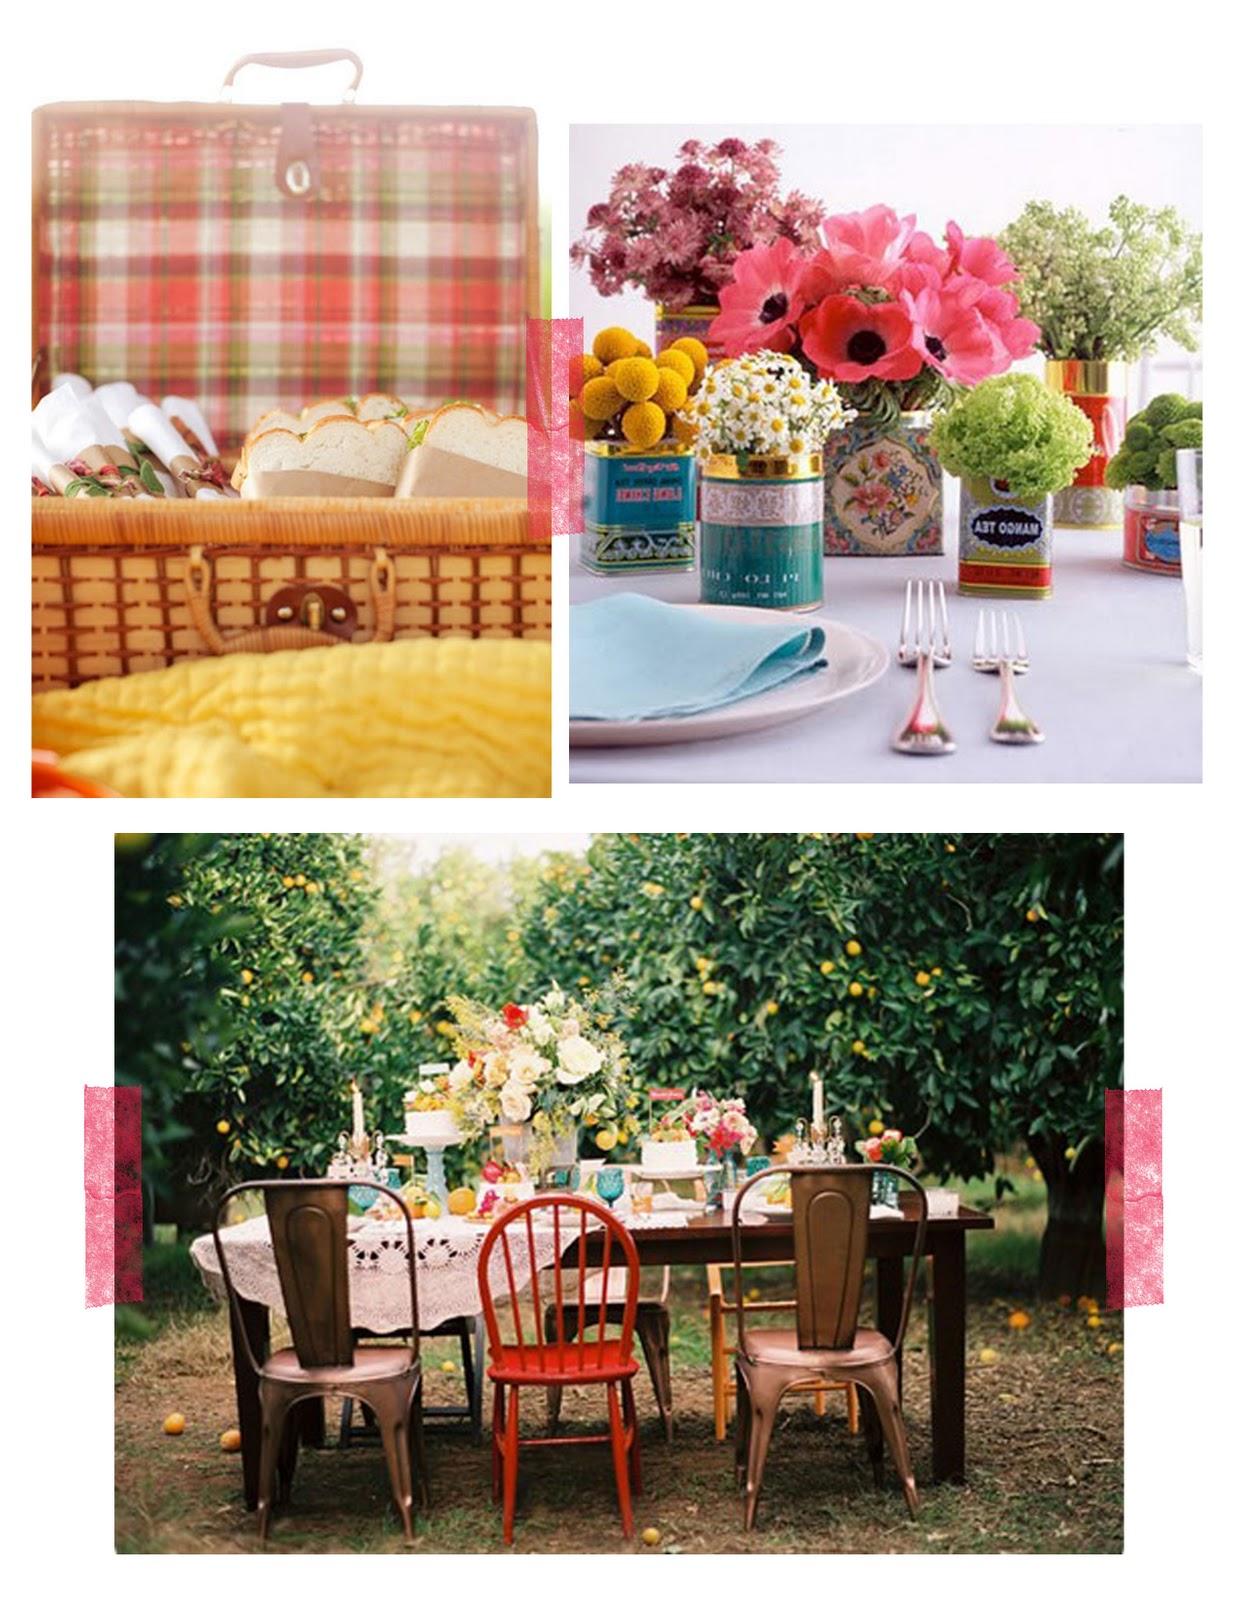 swoon studio imagined an indoor picnic. Black Bedroom Furniture Sets. Home Design Ideas